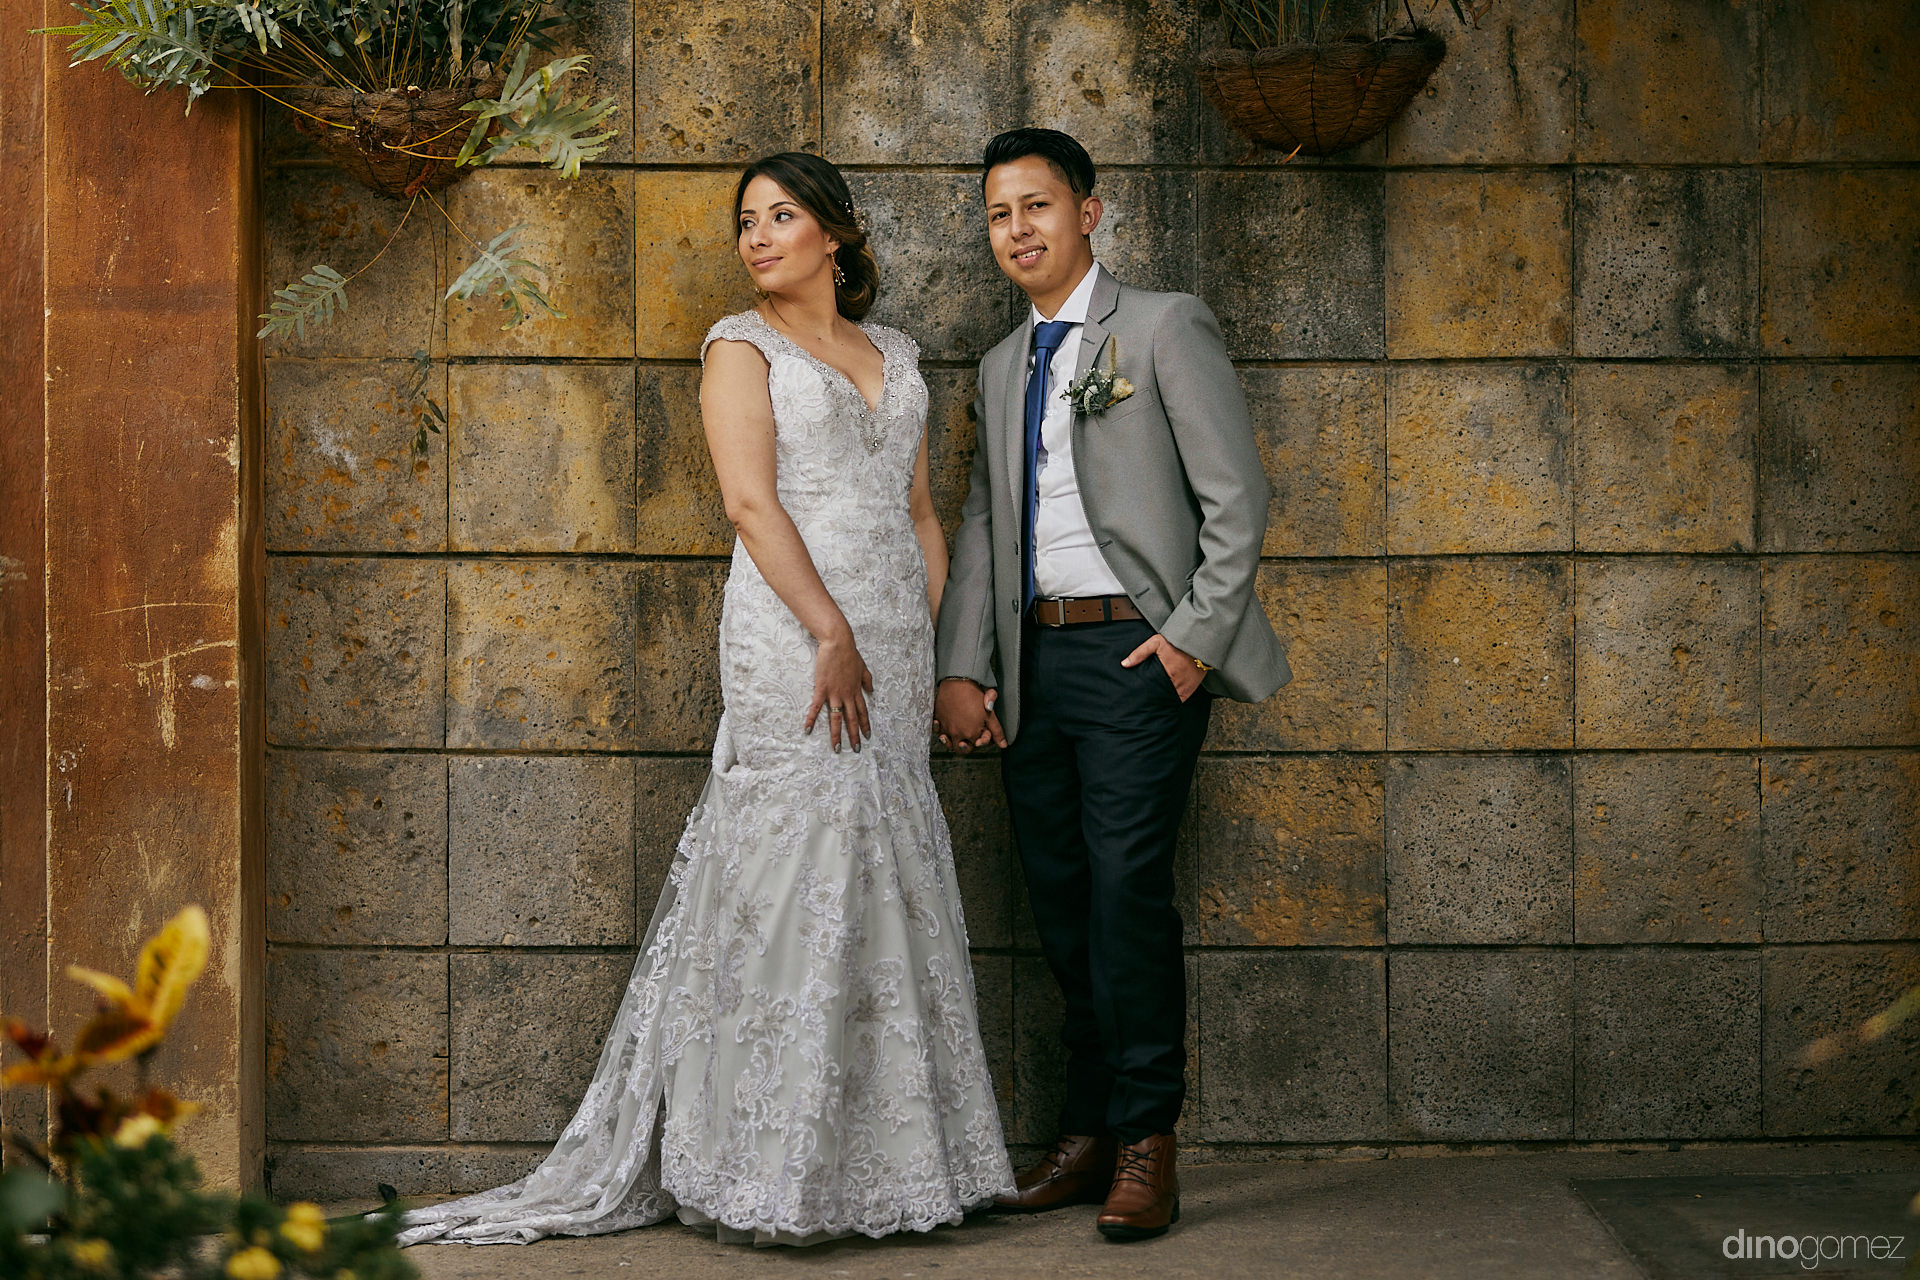 024 - Diy Budget Destination Weddings Can Be Prety Too!